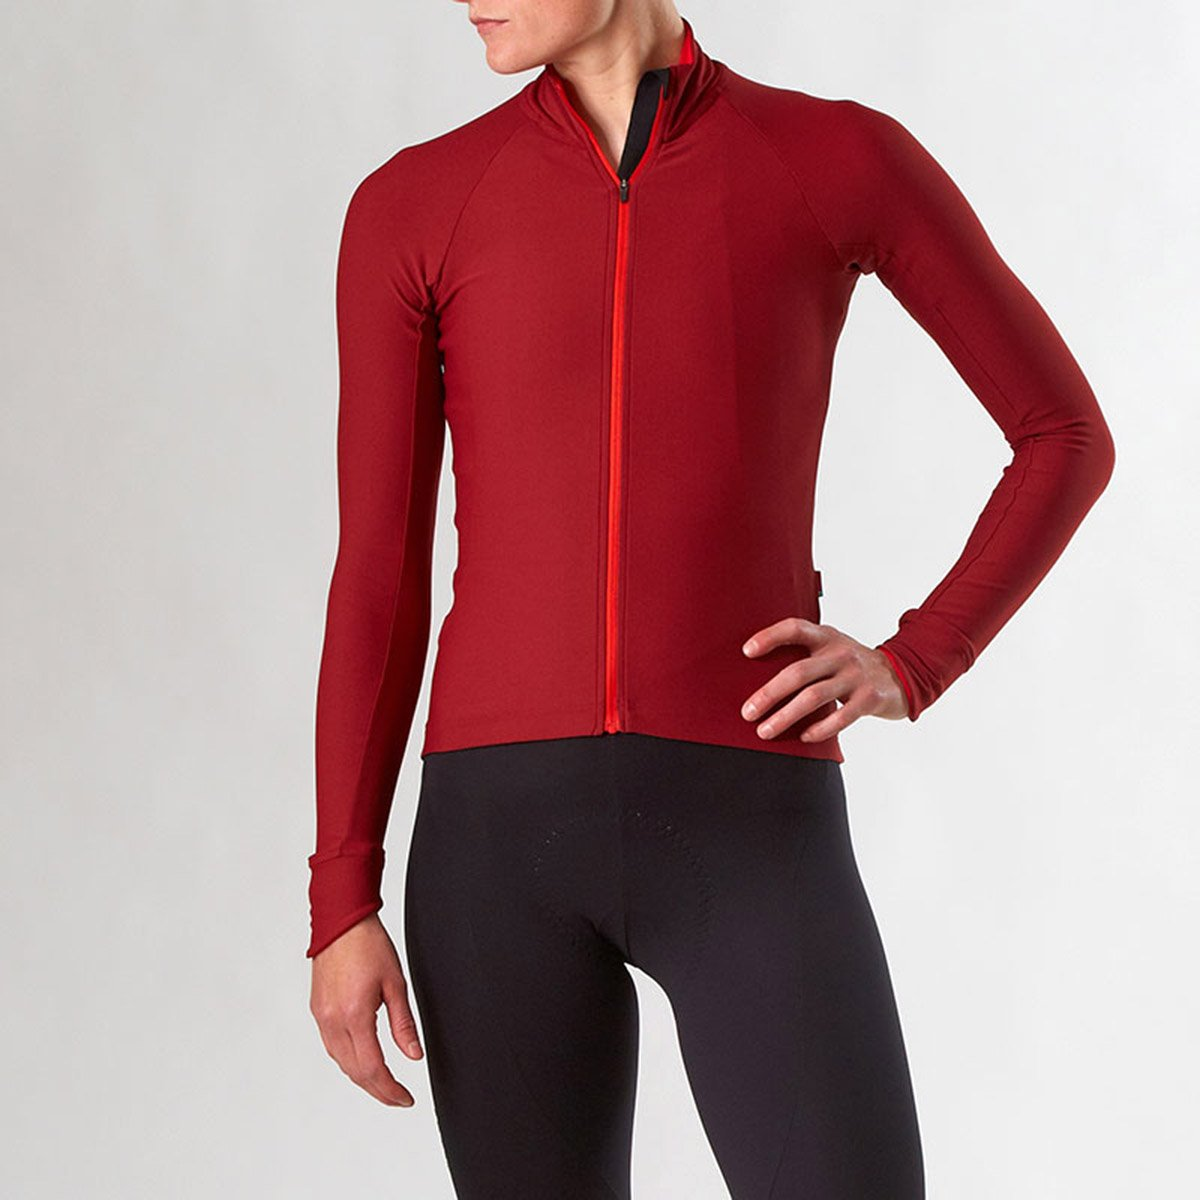 ZIbVoasoTFCXgUxa1gES_womens-es-long-sleeve-rust-red-fron_2000x.jpg